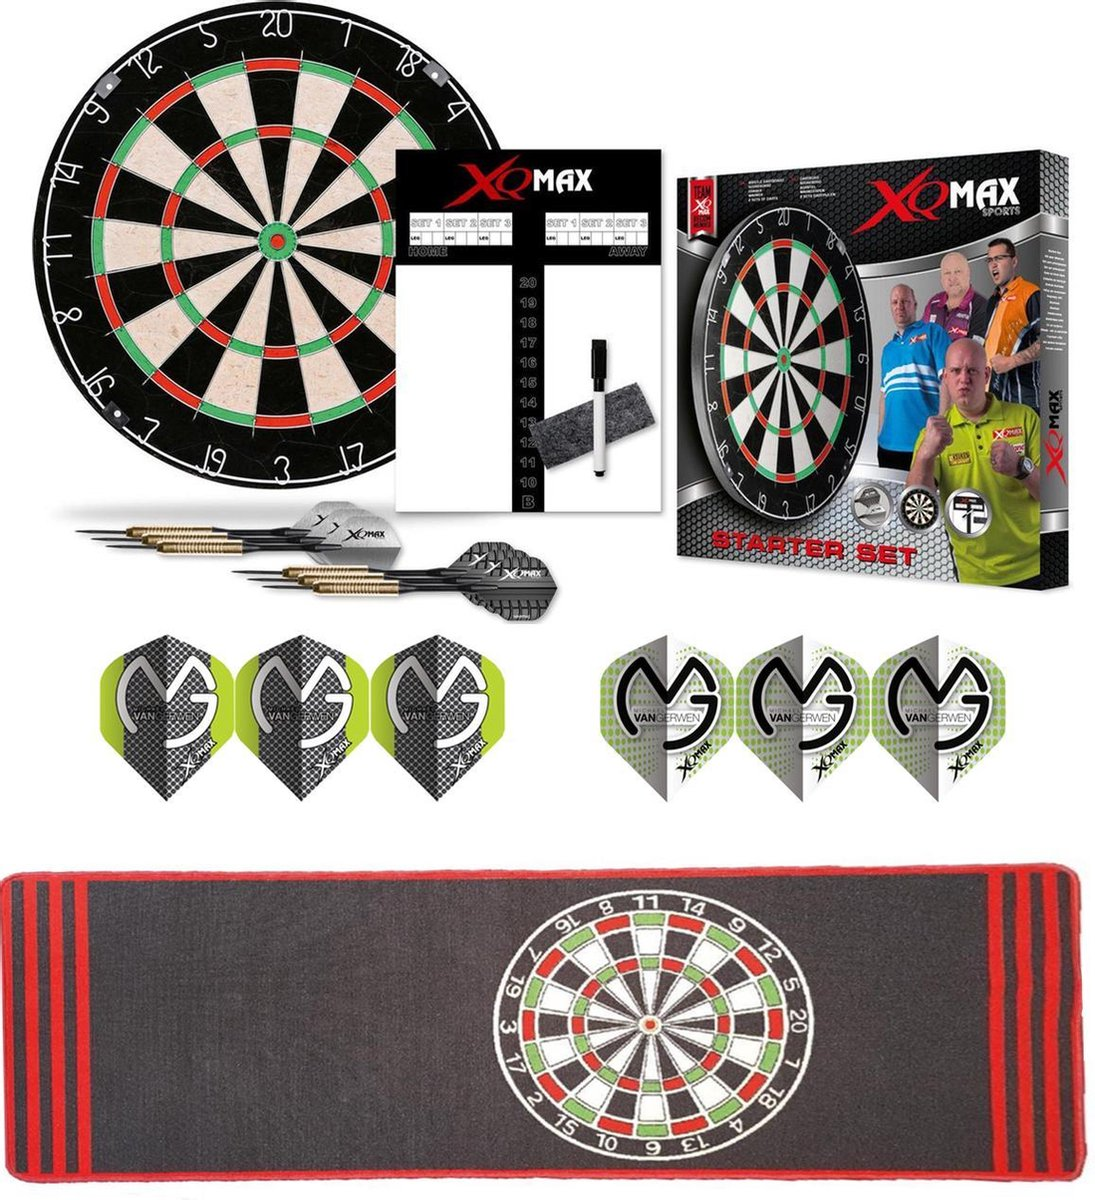 Dragon Darts MvG Antra complete dartset - dartbord - dartmat - dart shafts - dart flights - 2 sets - dartpijlen - dartset